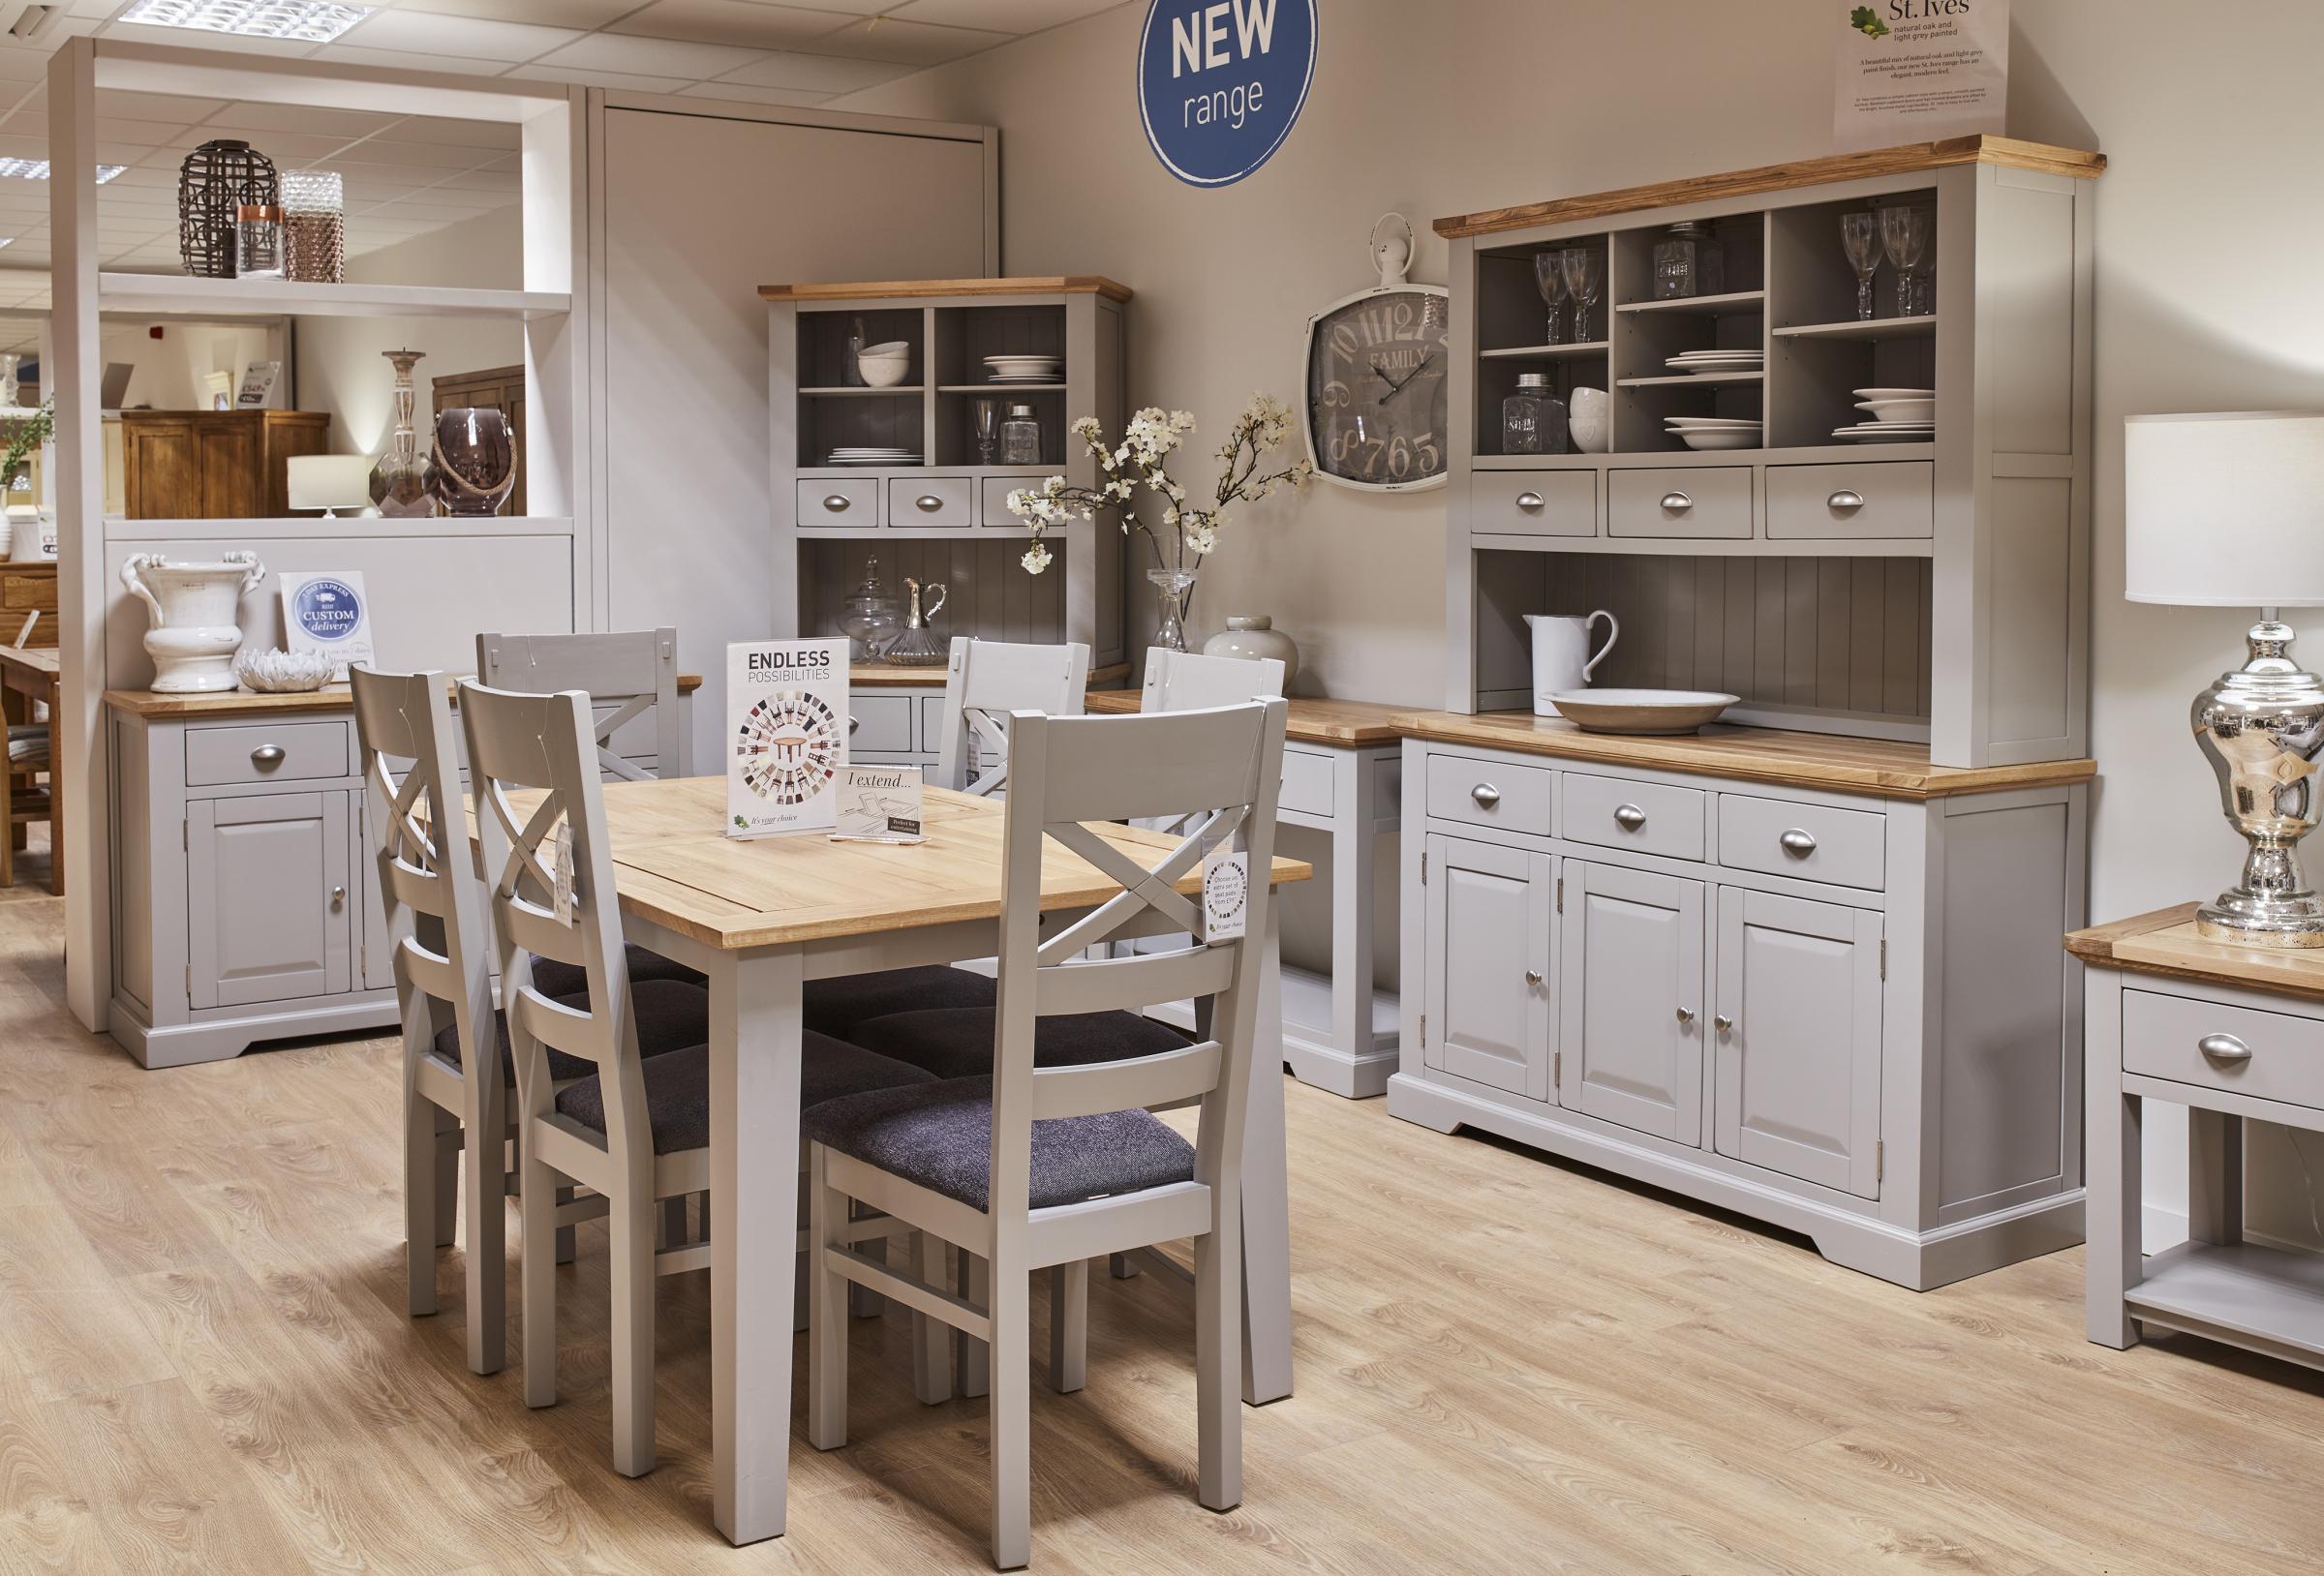 Oak Furniture Land Opens First Showroom In Newport Tomorrow